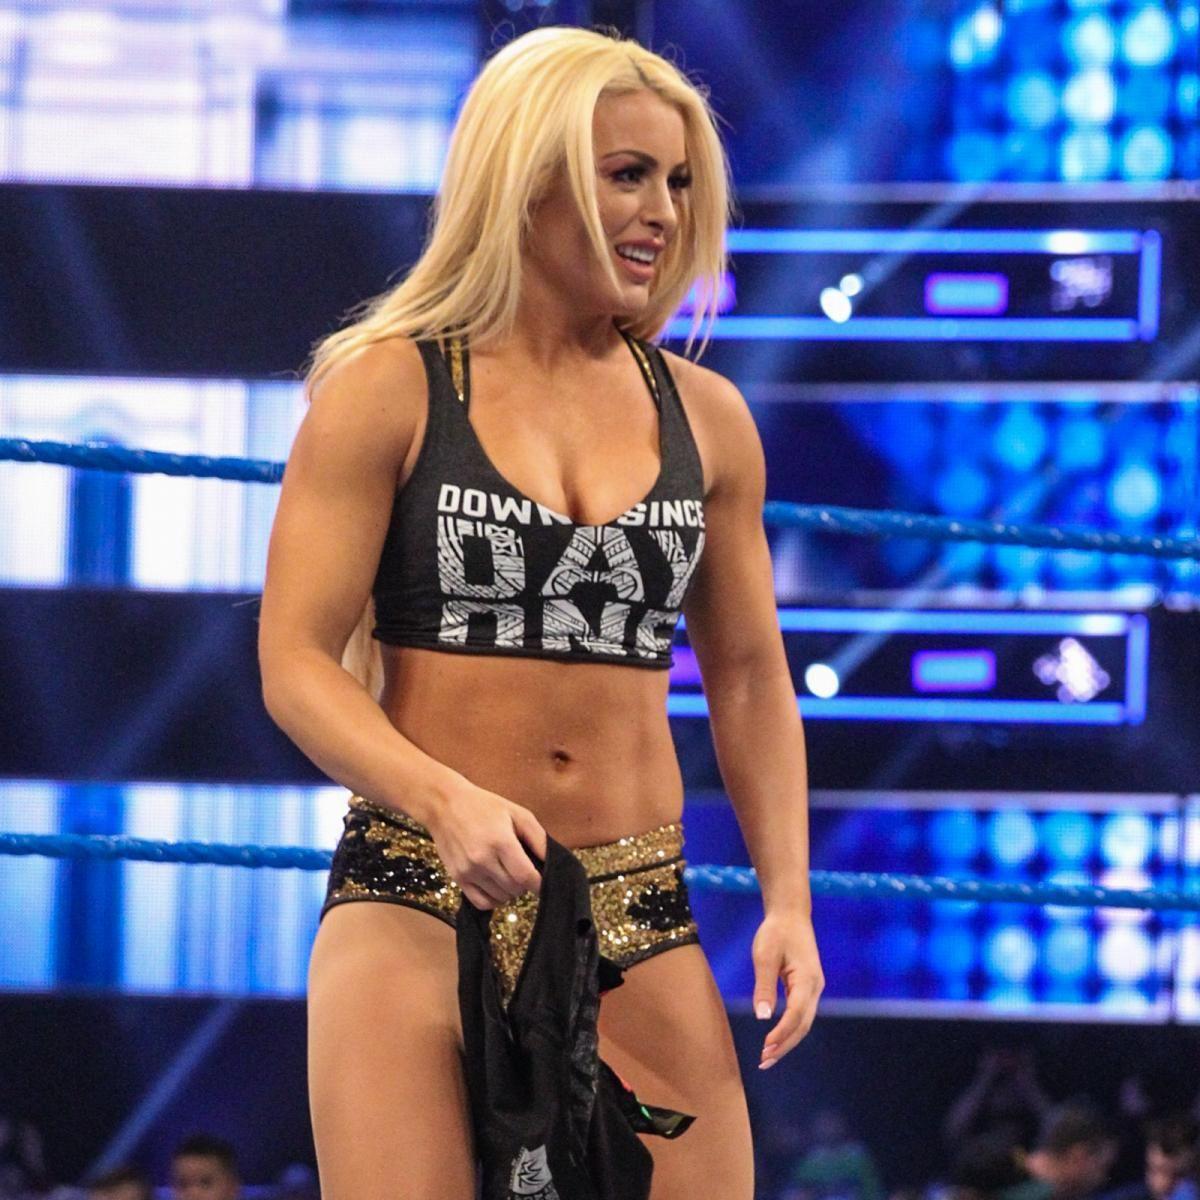 WWE Star Mandy Rose Takes #BussItChallenge; Videos Go Viral 4